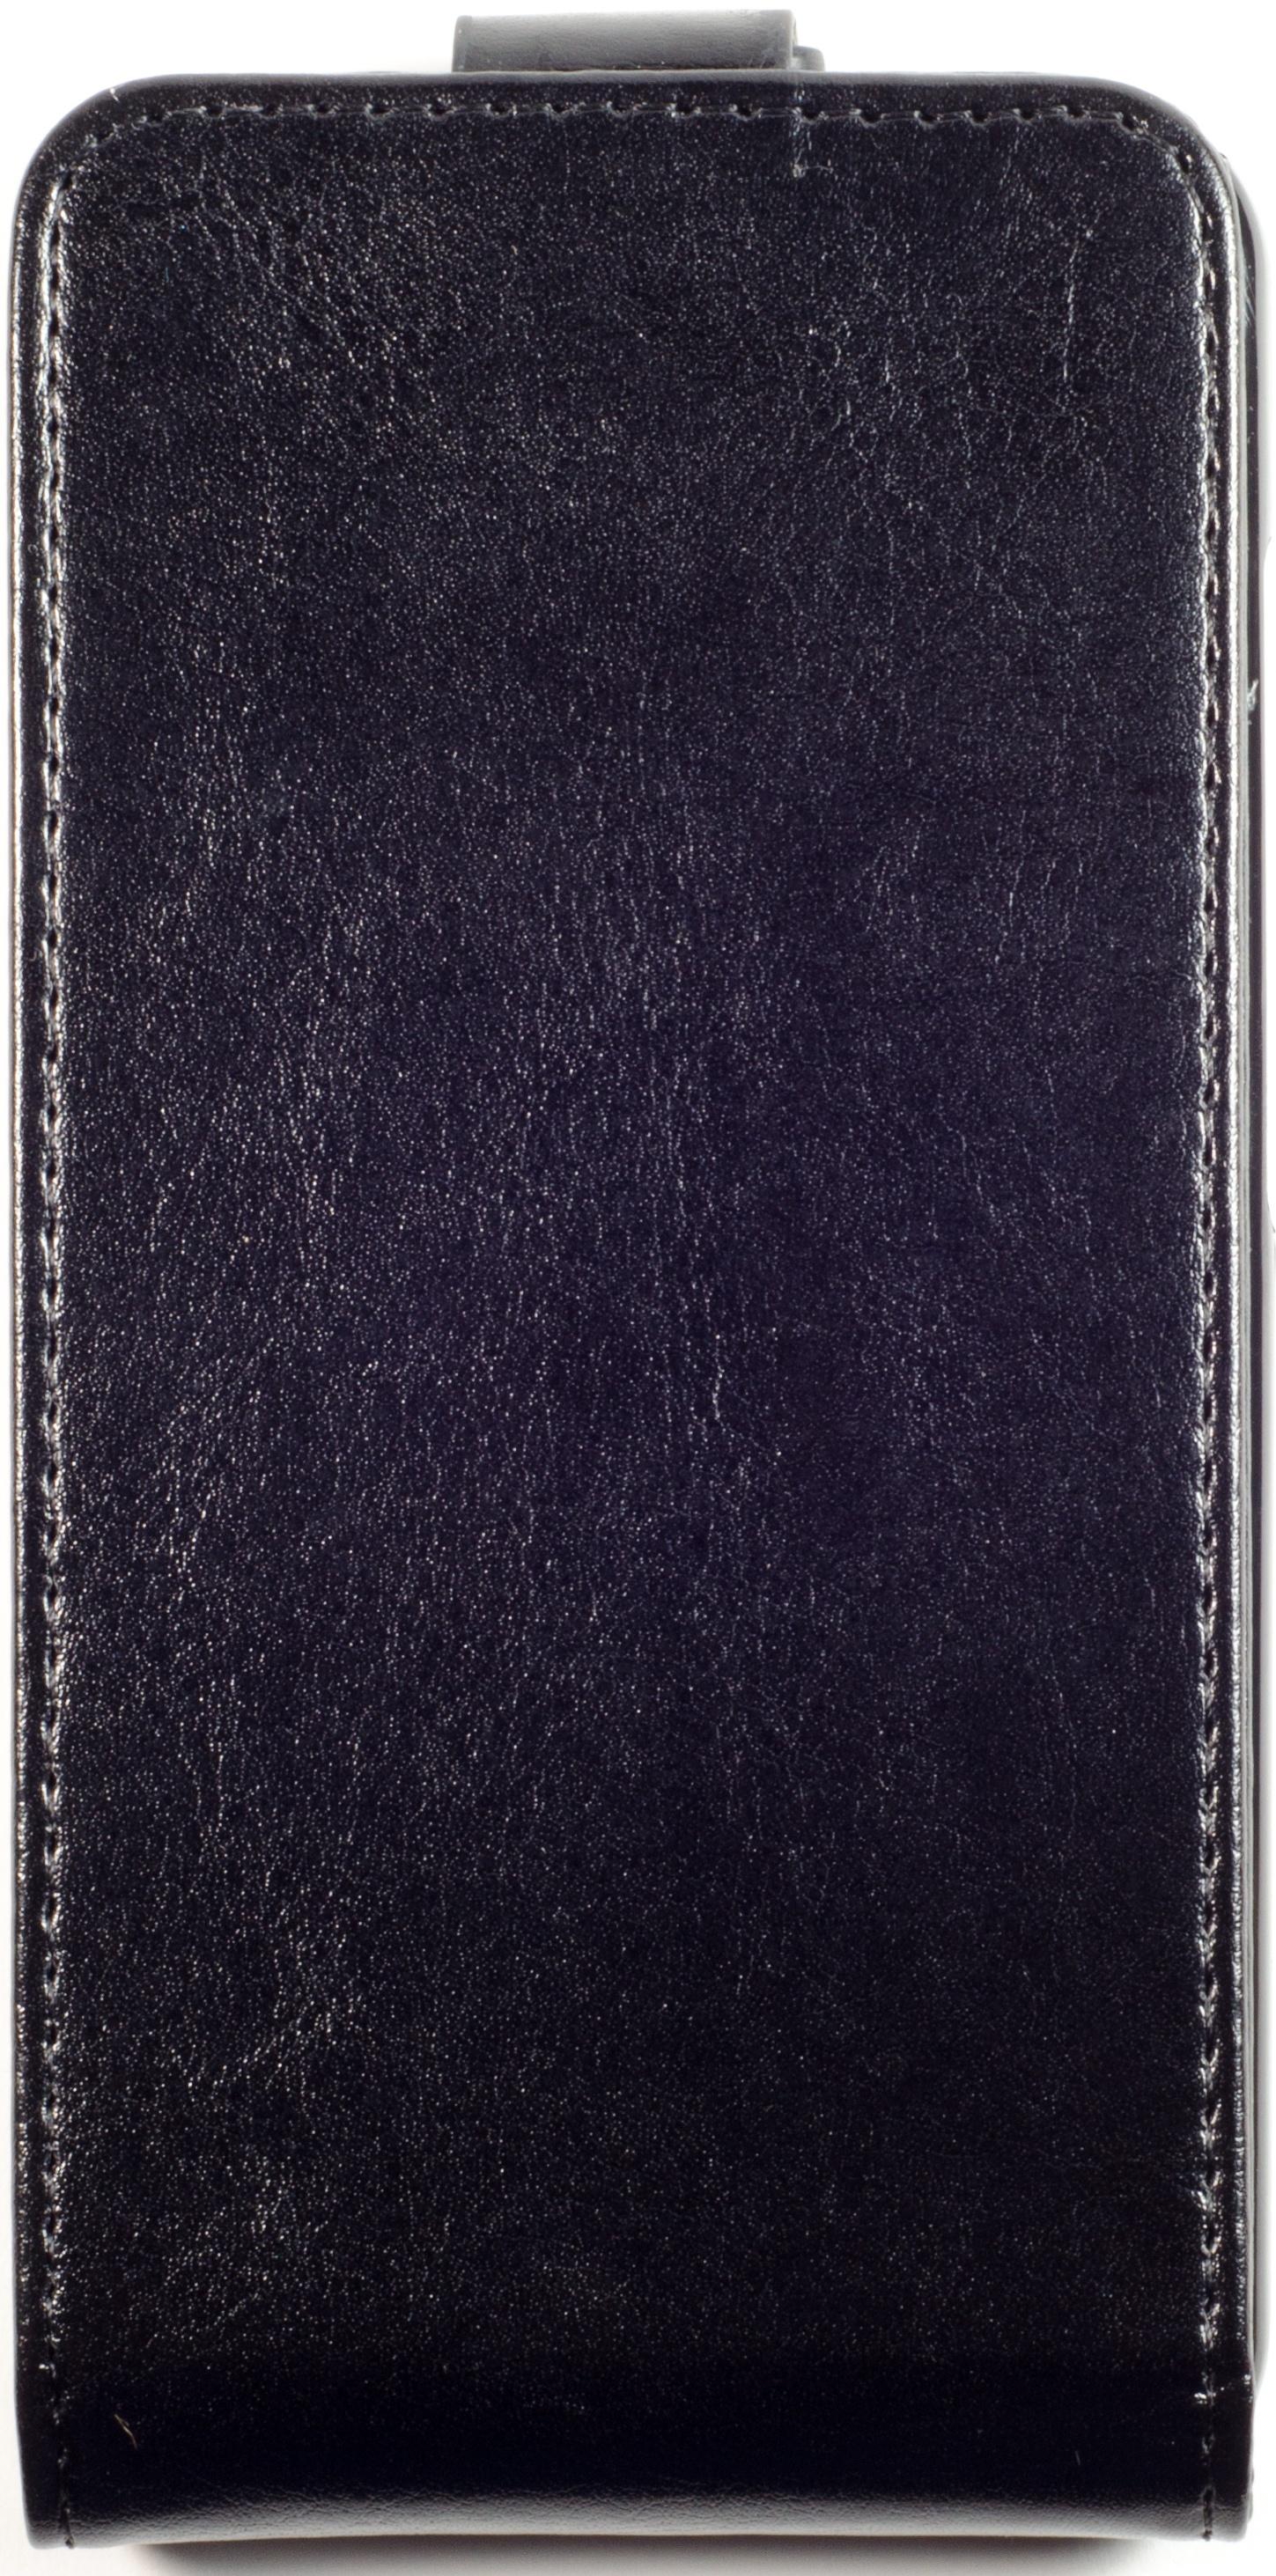 Чехол skinBOX для HTC Desire 616, 2000000027838, черный чехол для htc desire 728 htc hc c1210 прозрачный